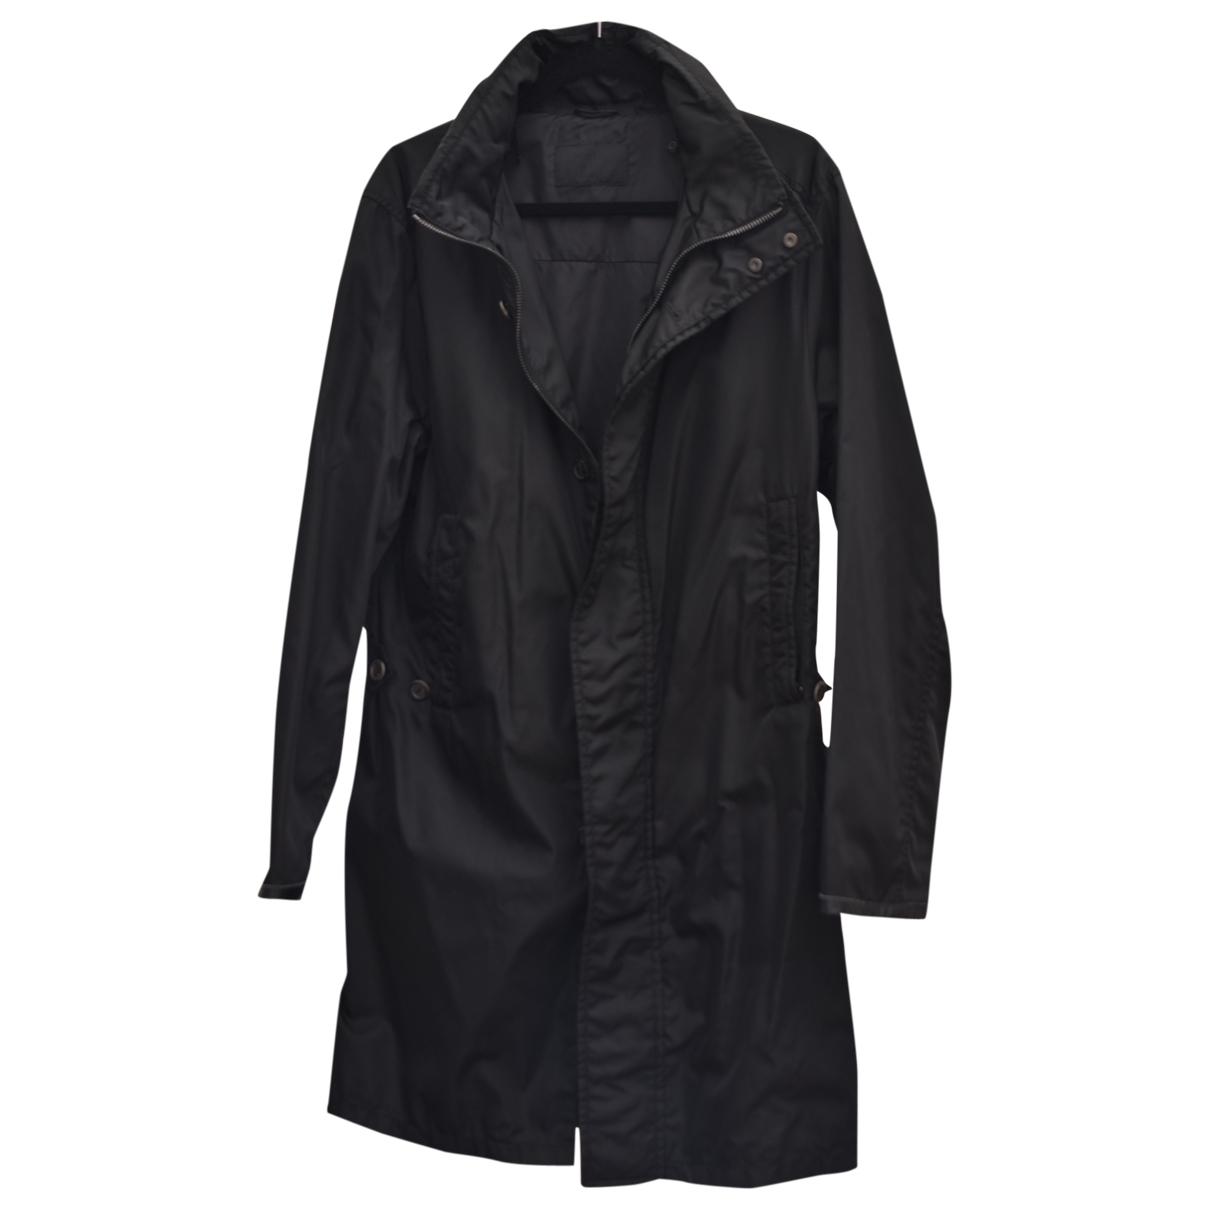 Prada \N Black coat  for Men S International